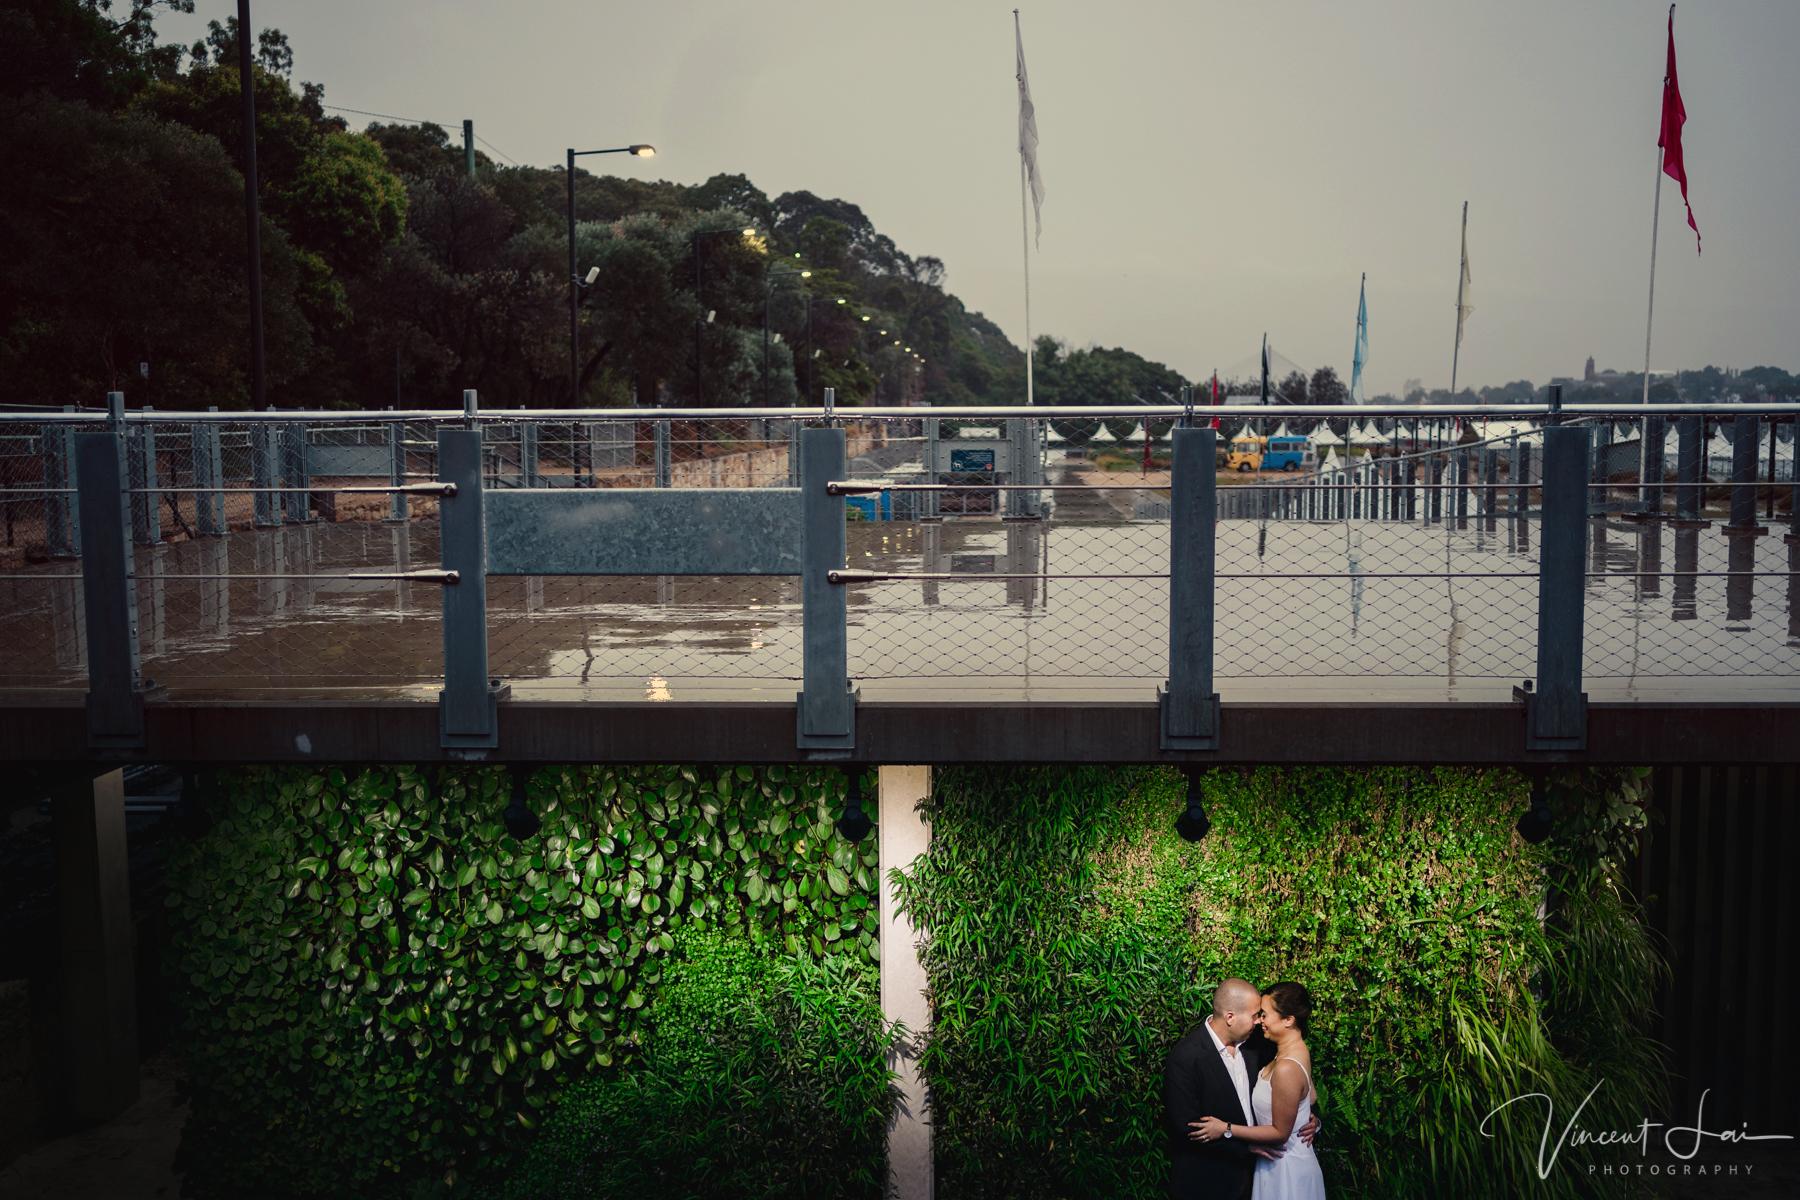 Sydney Prewedding Photography